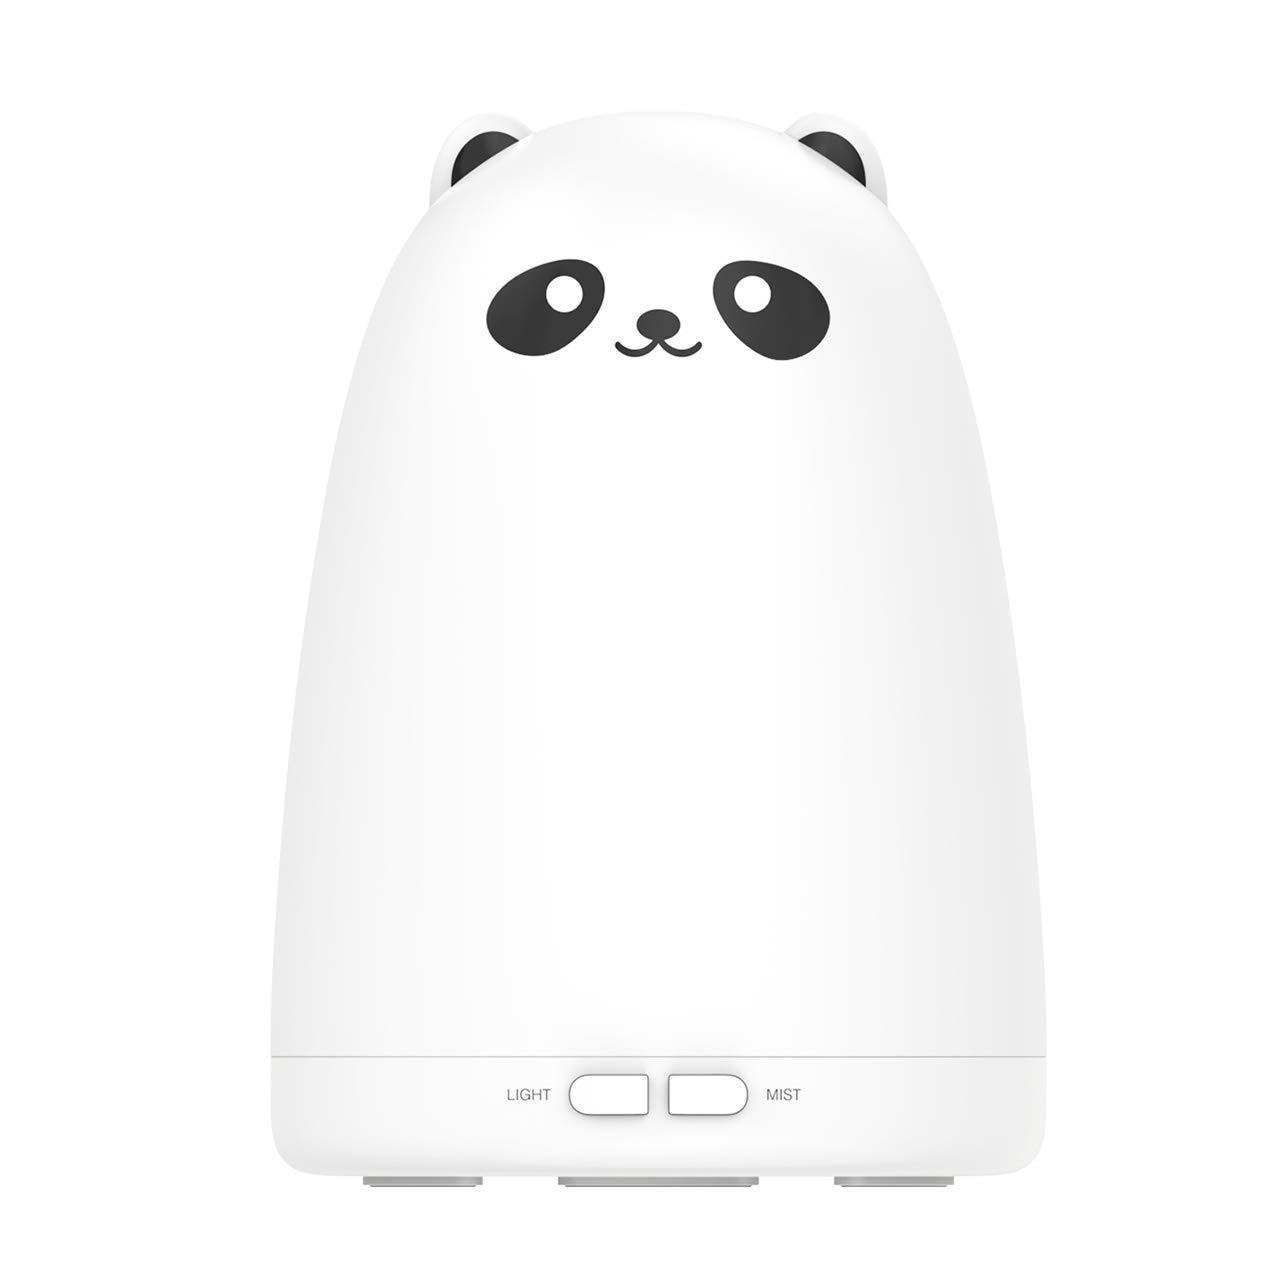 VicTsing 160ml Difusor de Aceites Esenciales Difusor Aroma ultra Silenciosa Adorable con apariencia de Panda con Modo de Reposo 4 Colores Apagado Autom/ático sin Agua-Blanco